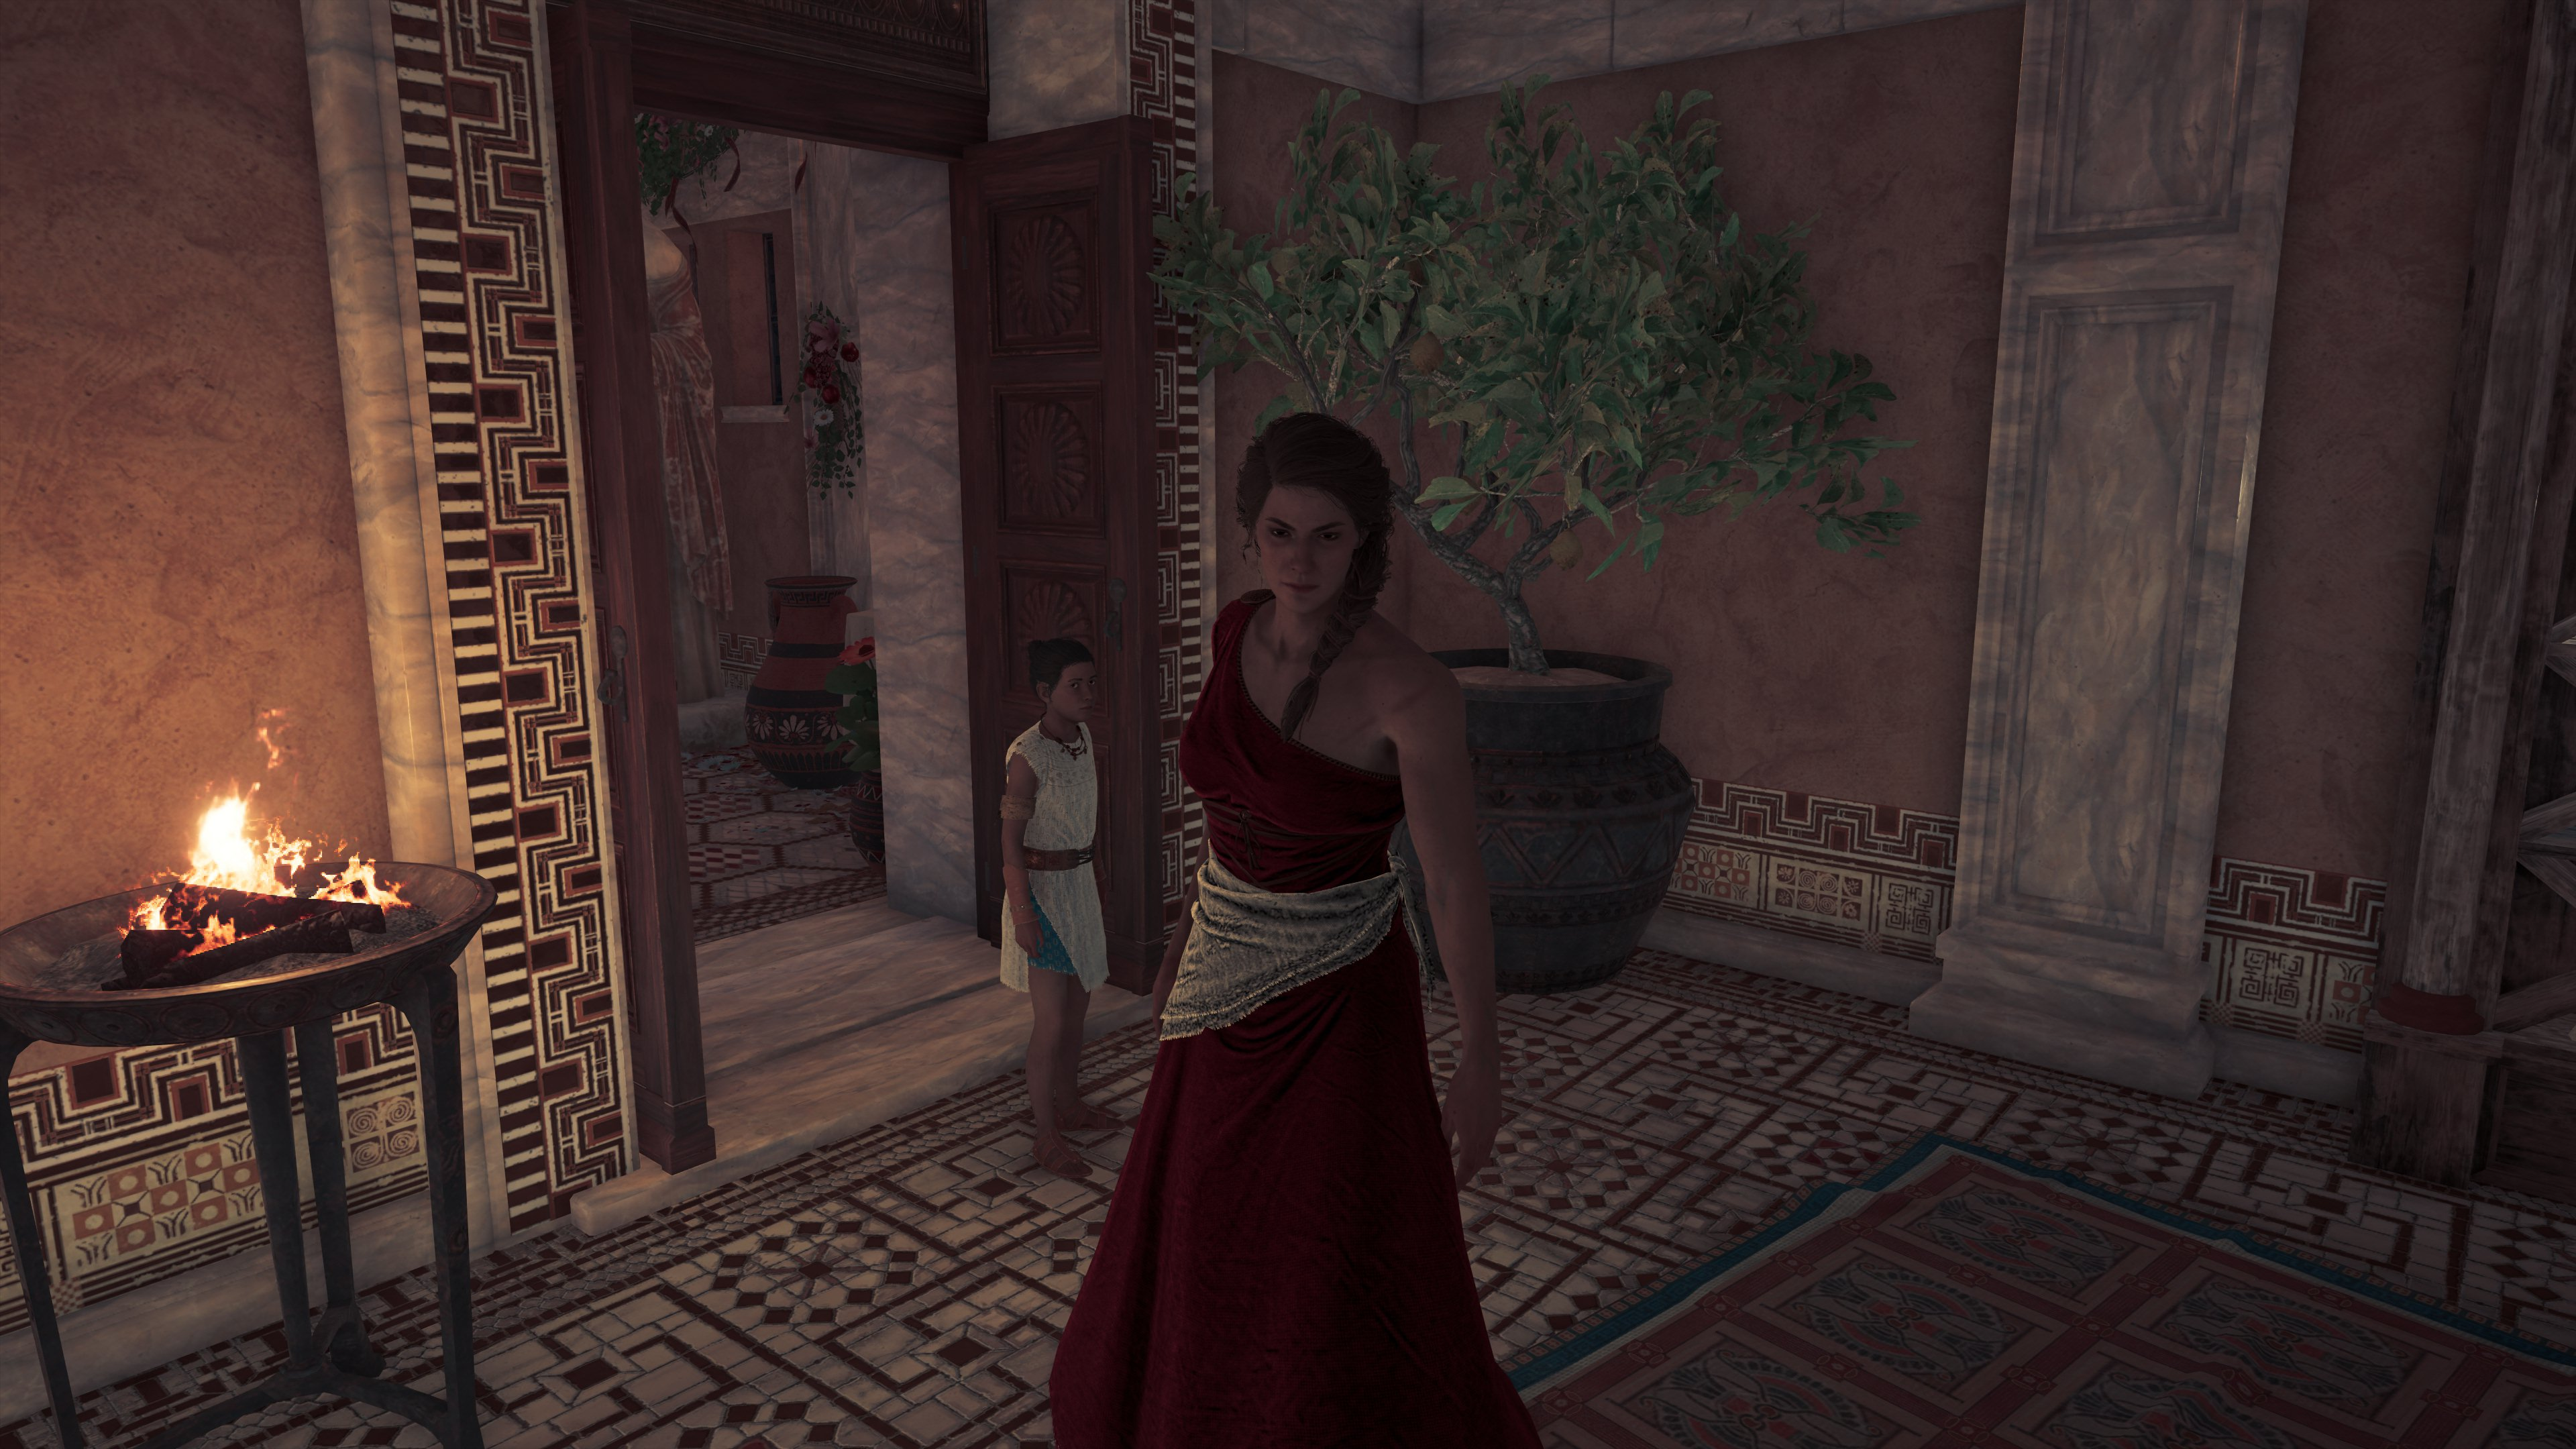 20181024005527.jpg - Assassin's Creed: Odyssey